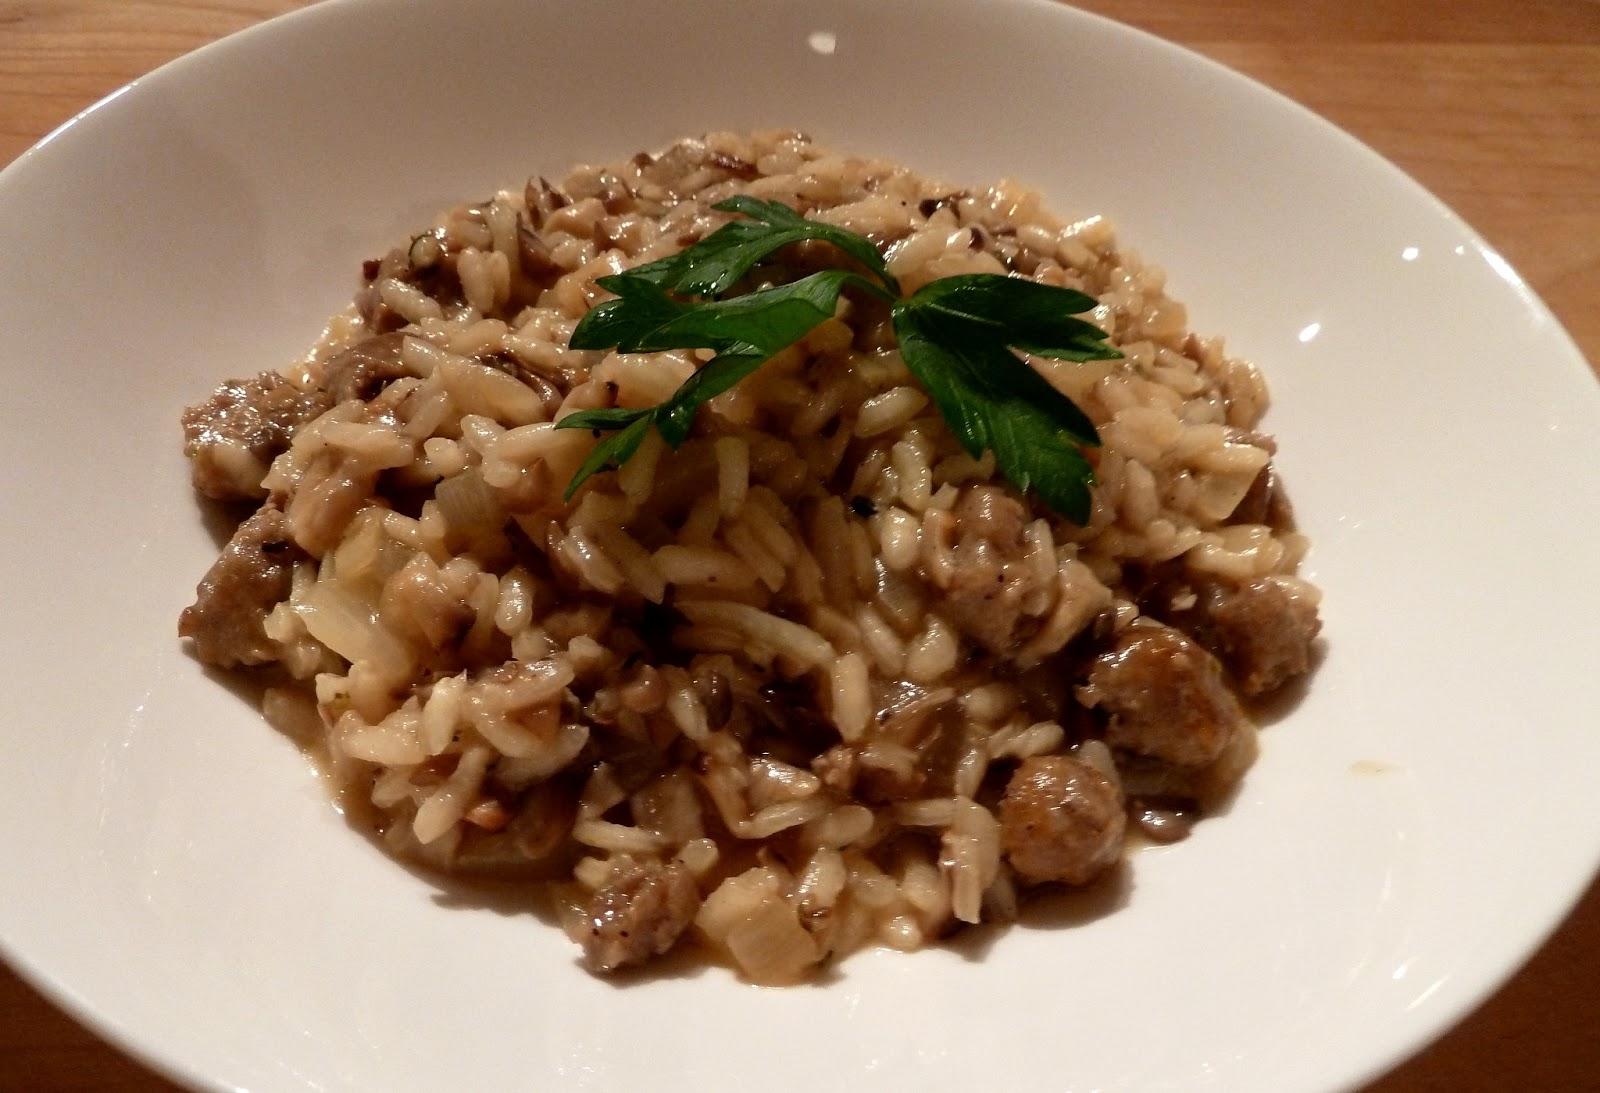 ... mushroom risotto sausage mushroom risotto sausage and mushroom risotto